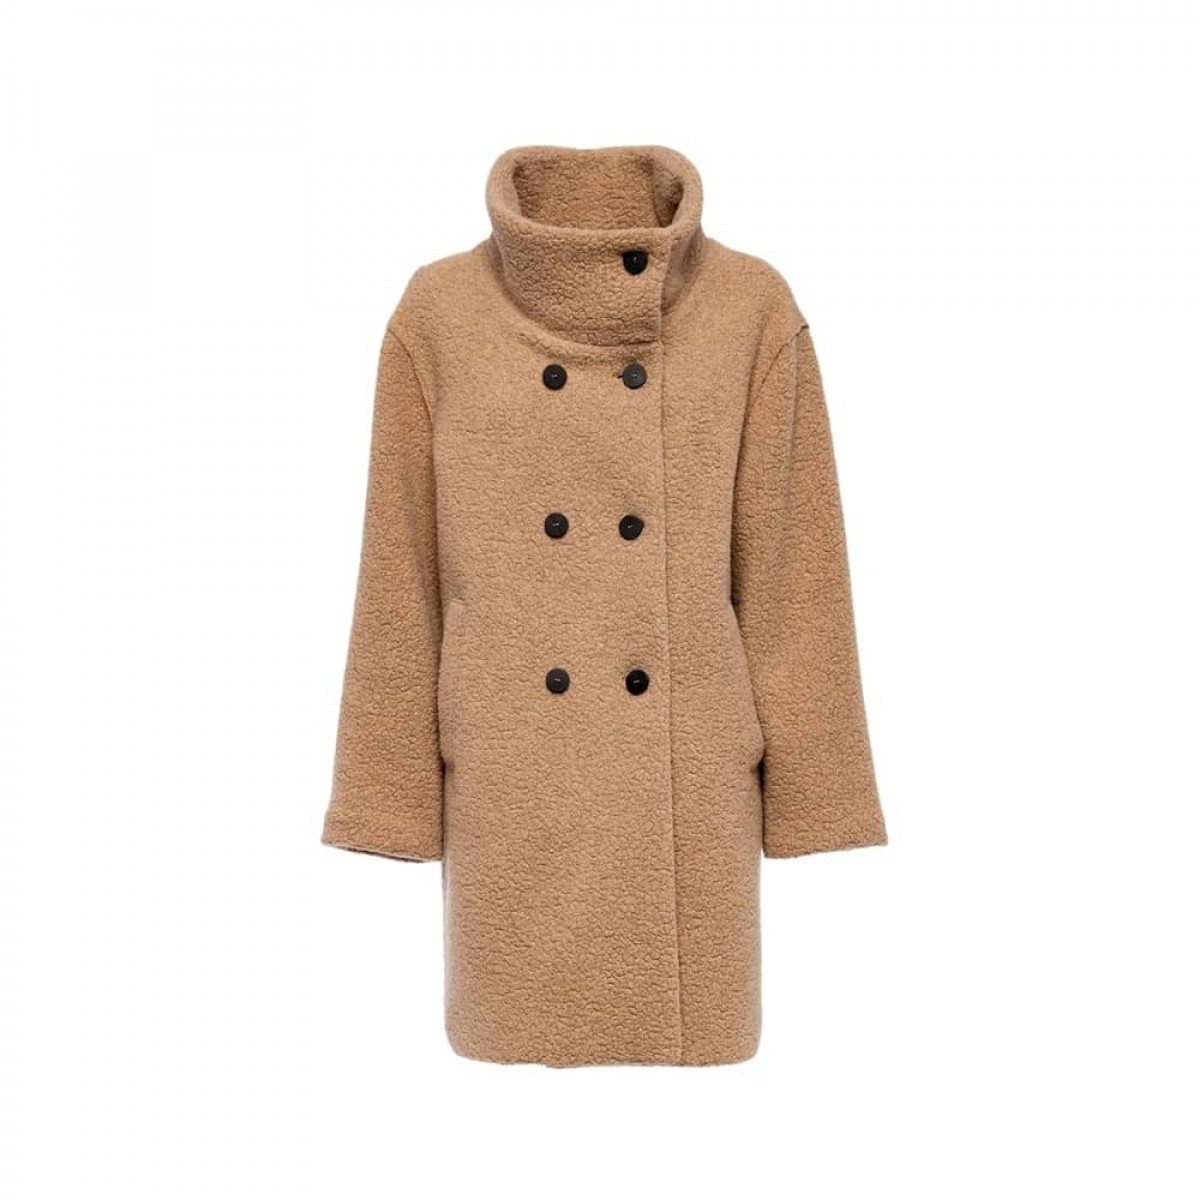 funnel collar coat bouclé - tan - front